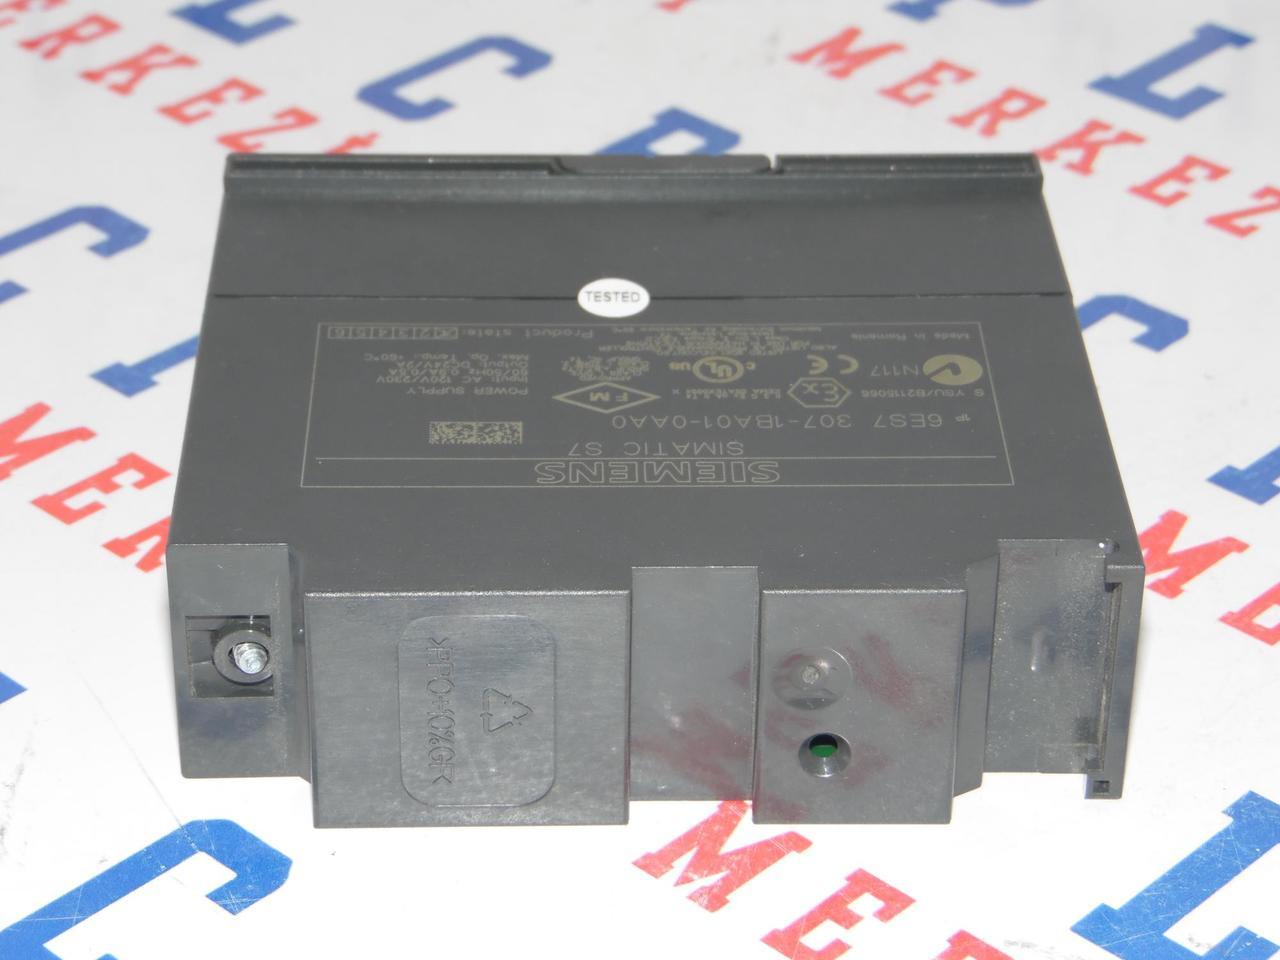 Siemens Simatic S7 Power Supply 6ES7307-1EA00-0AA0 6ES7 307-1EA00-0AA0 E:04